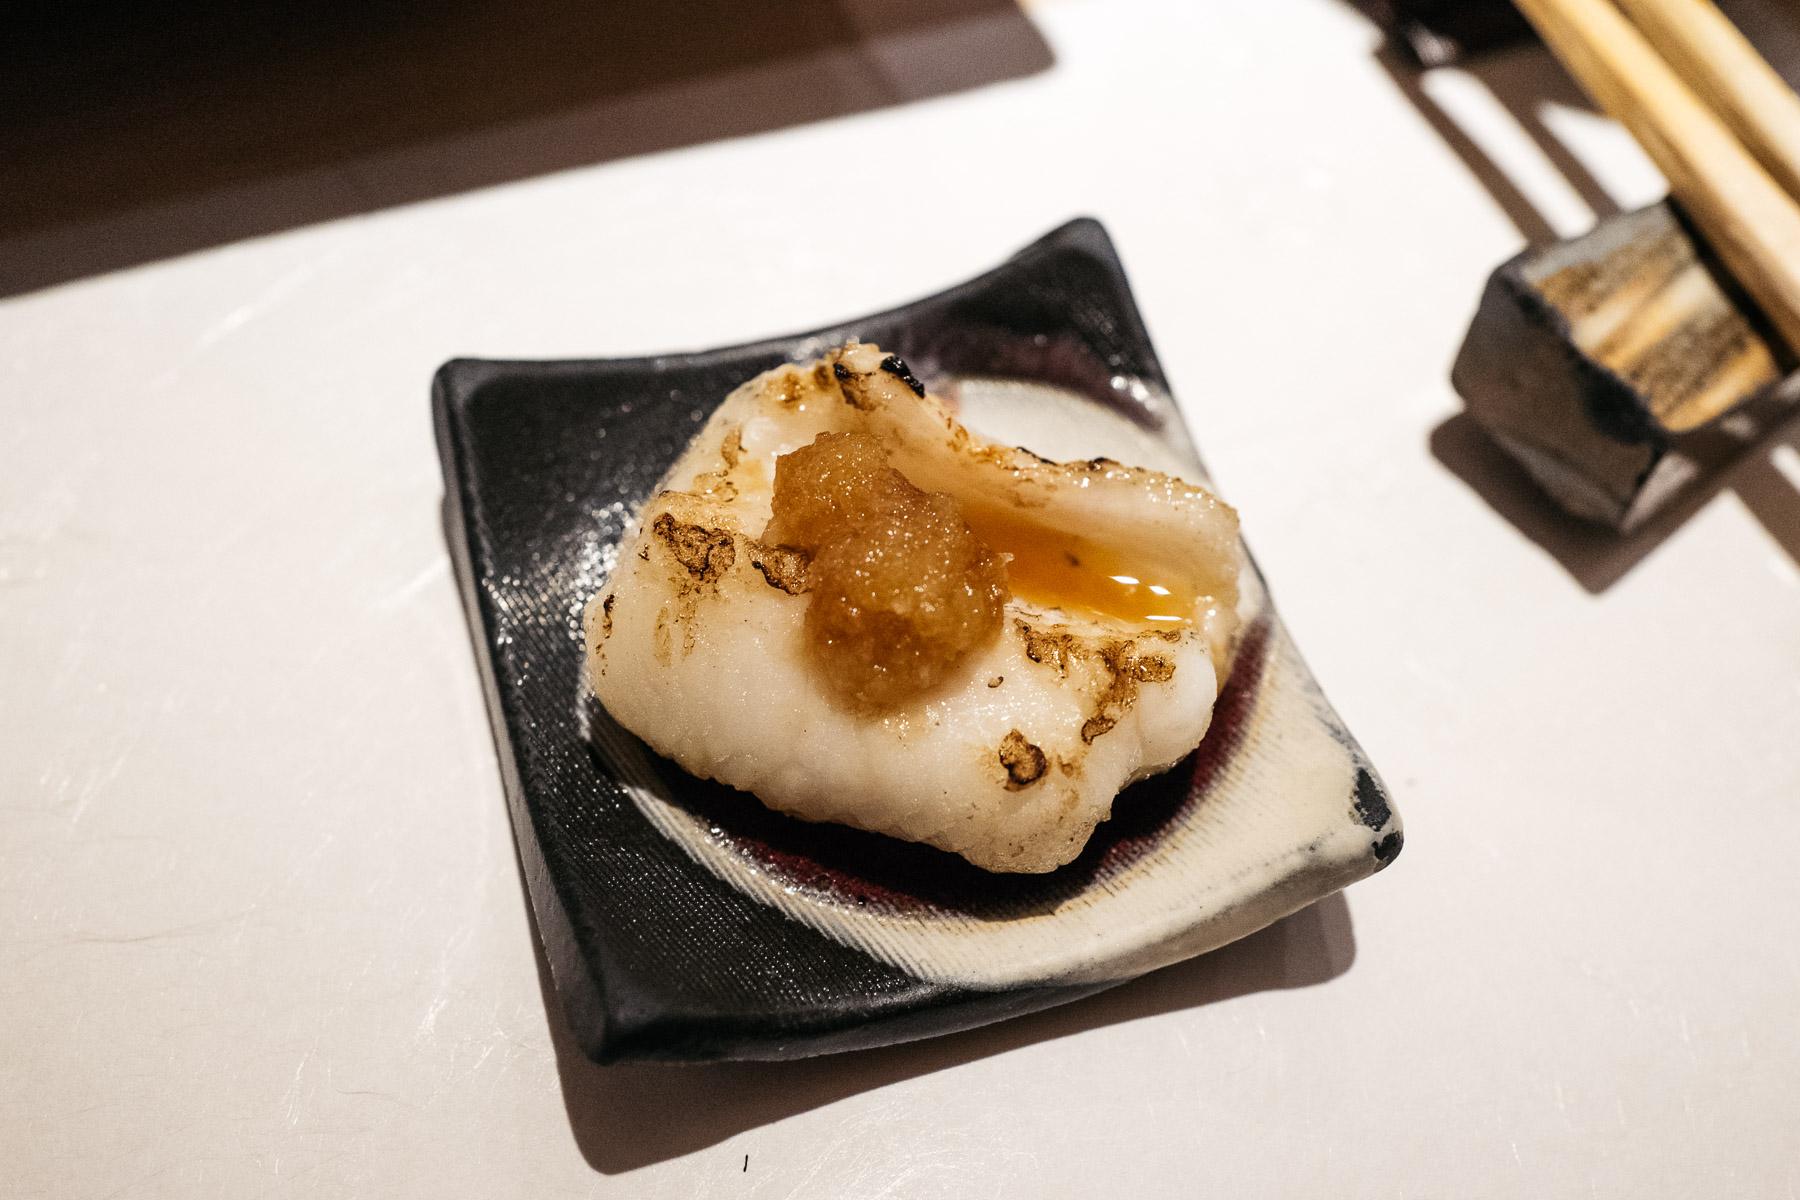 Anago no shirayaki (grillowany węgorz morski)